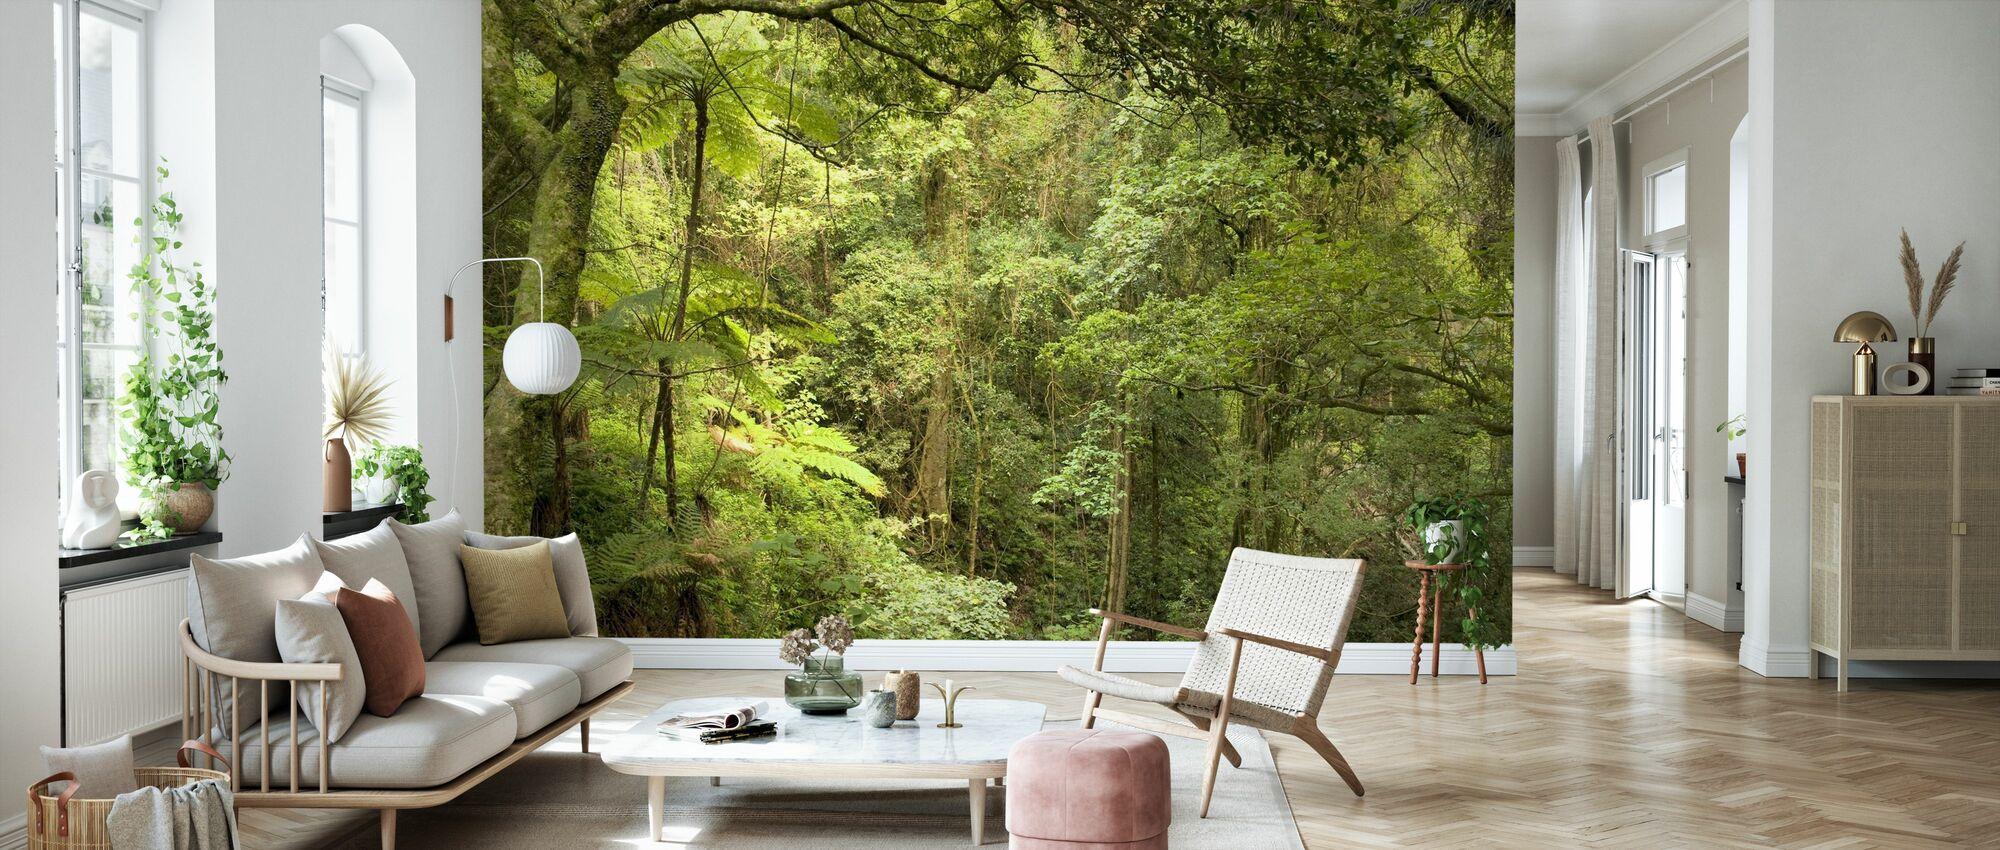 Bunya Mountains National Park - Wallpaper - Living Room